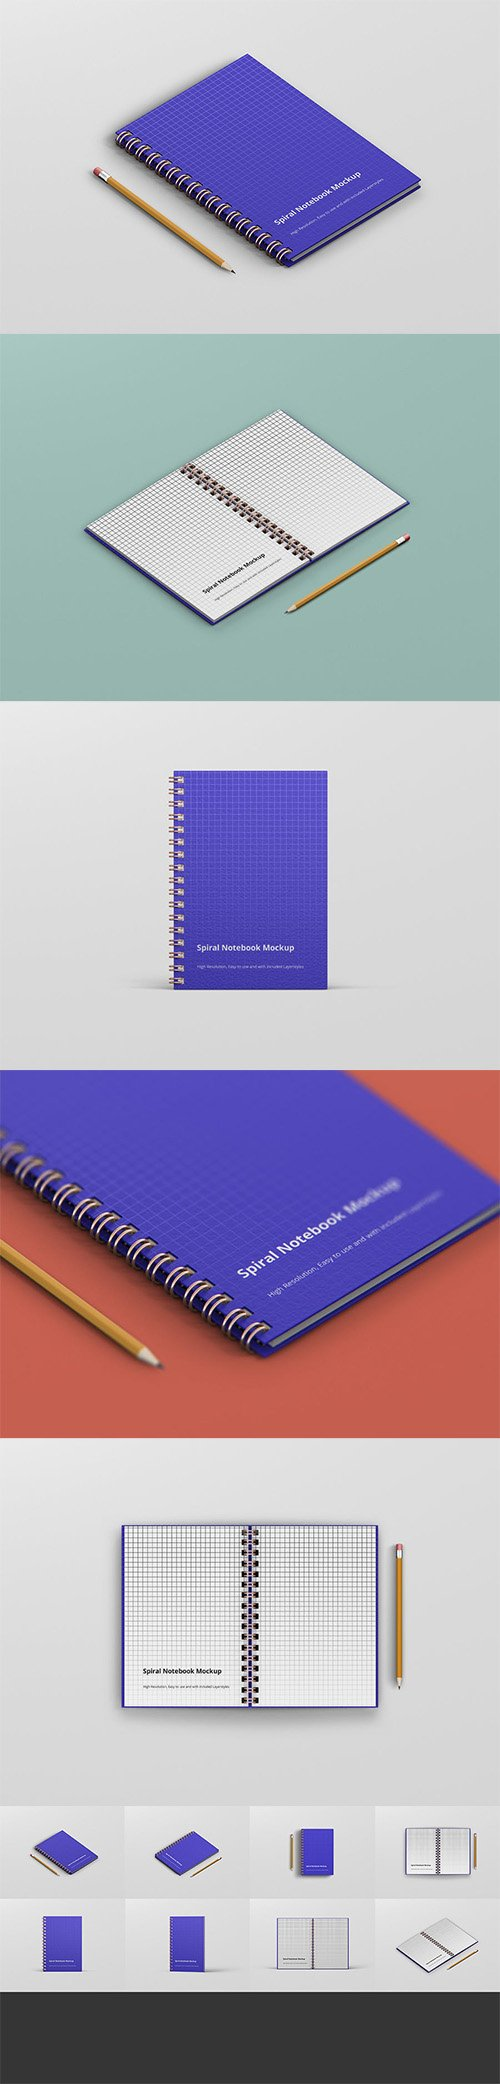 Spiral Ring Notebook Mockup